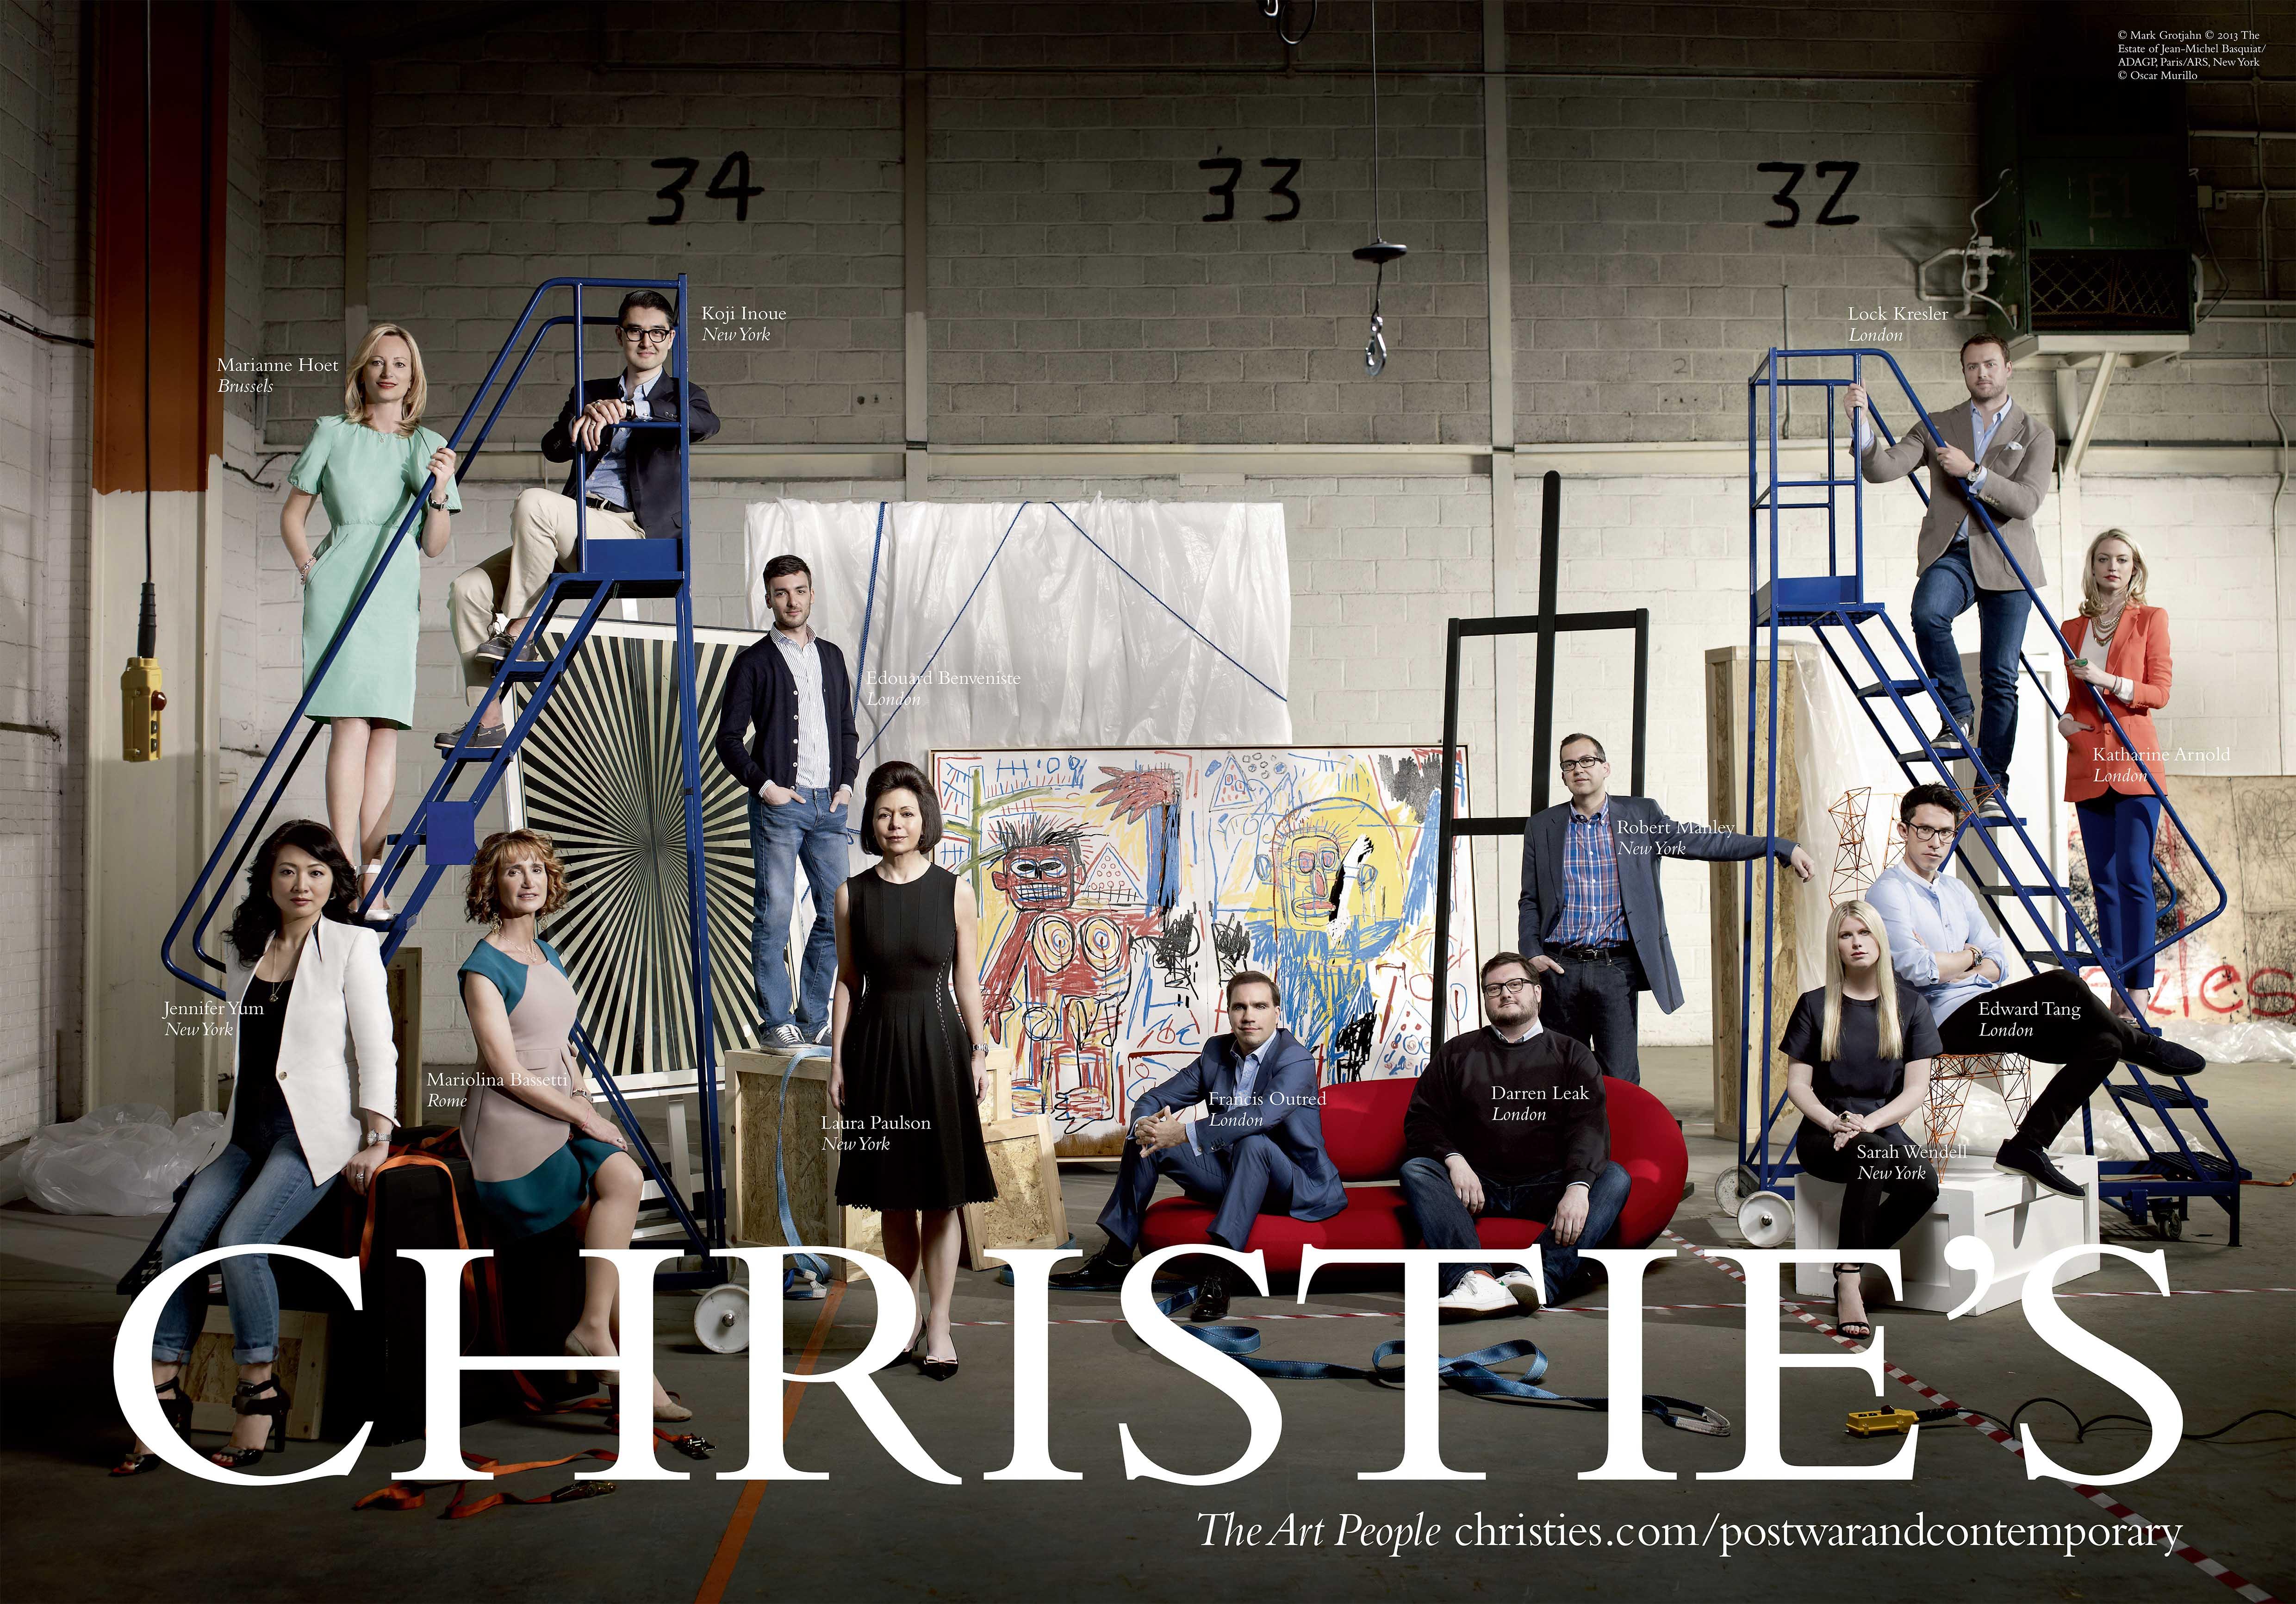 '4' Christie's, Mark Reddy, BBH.jpg